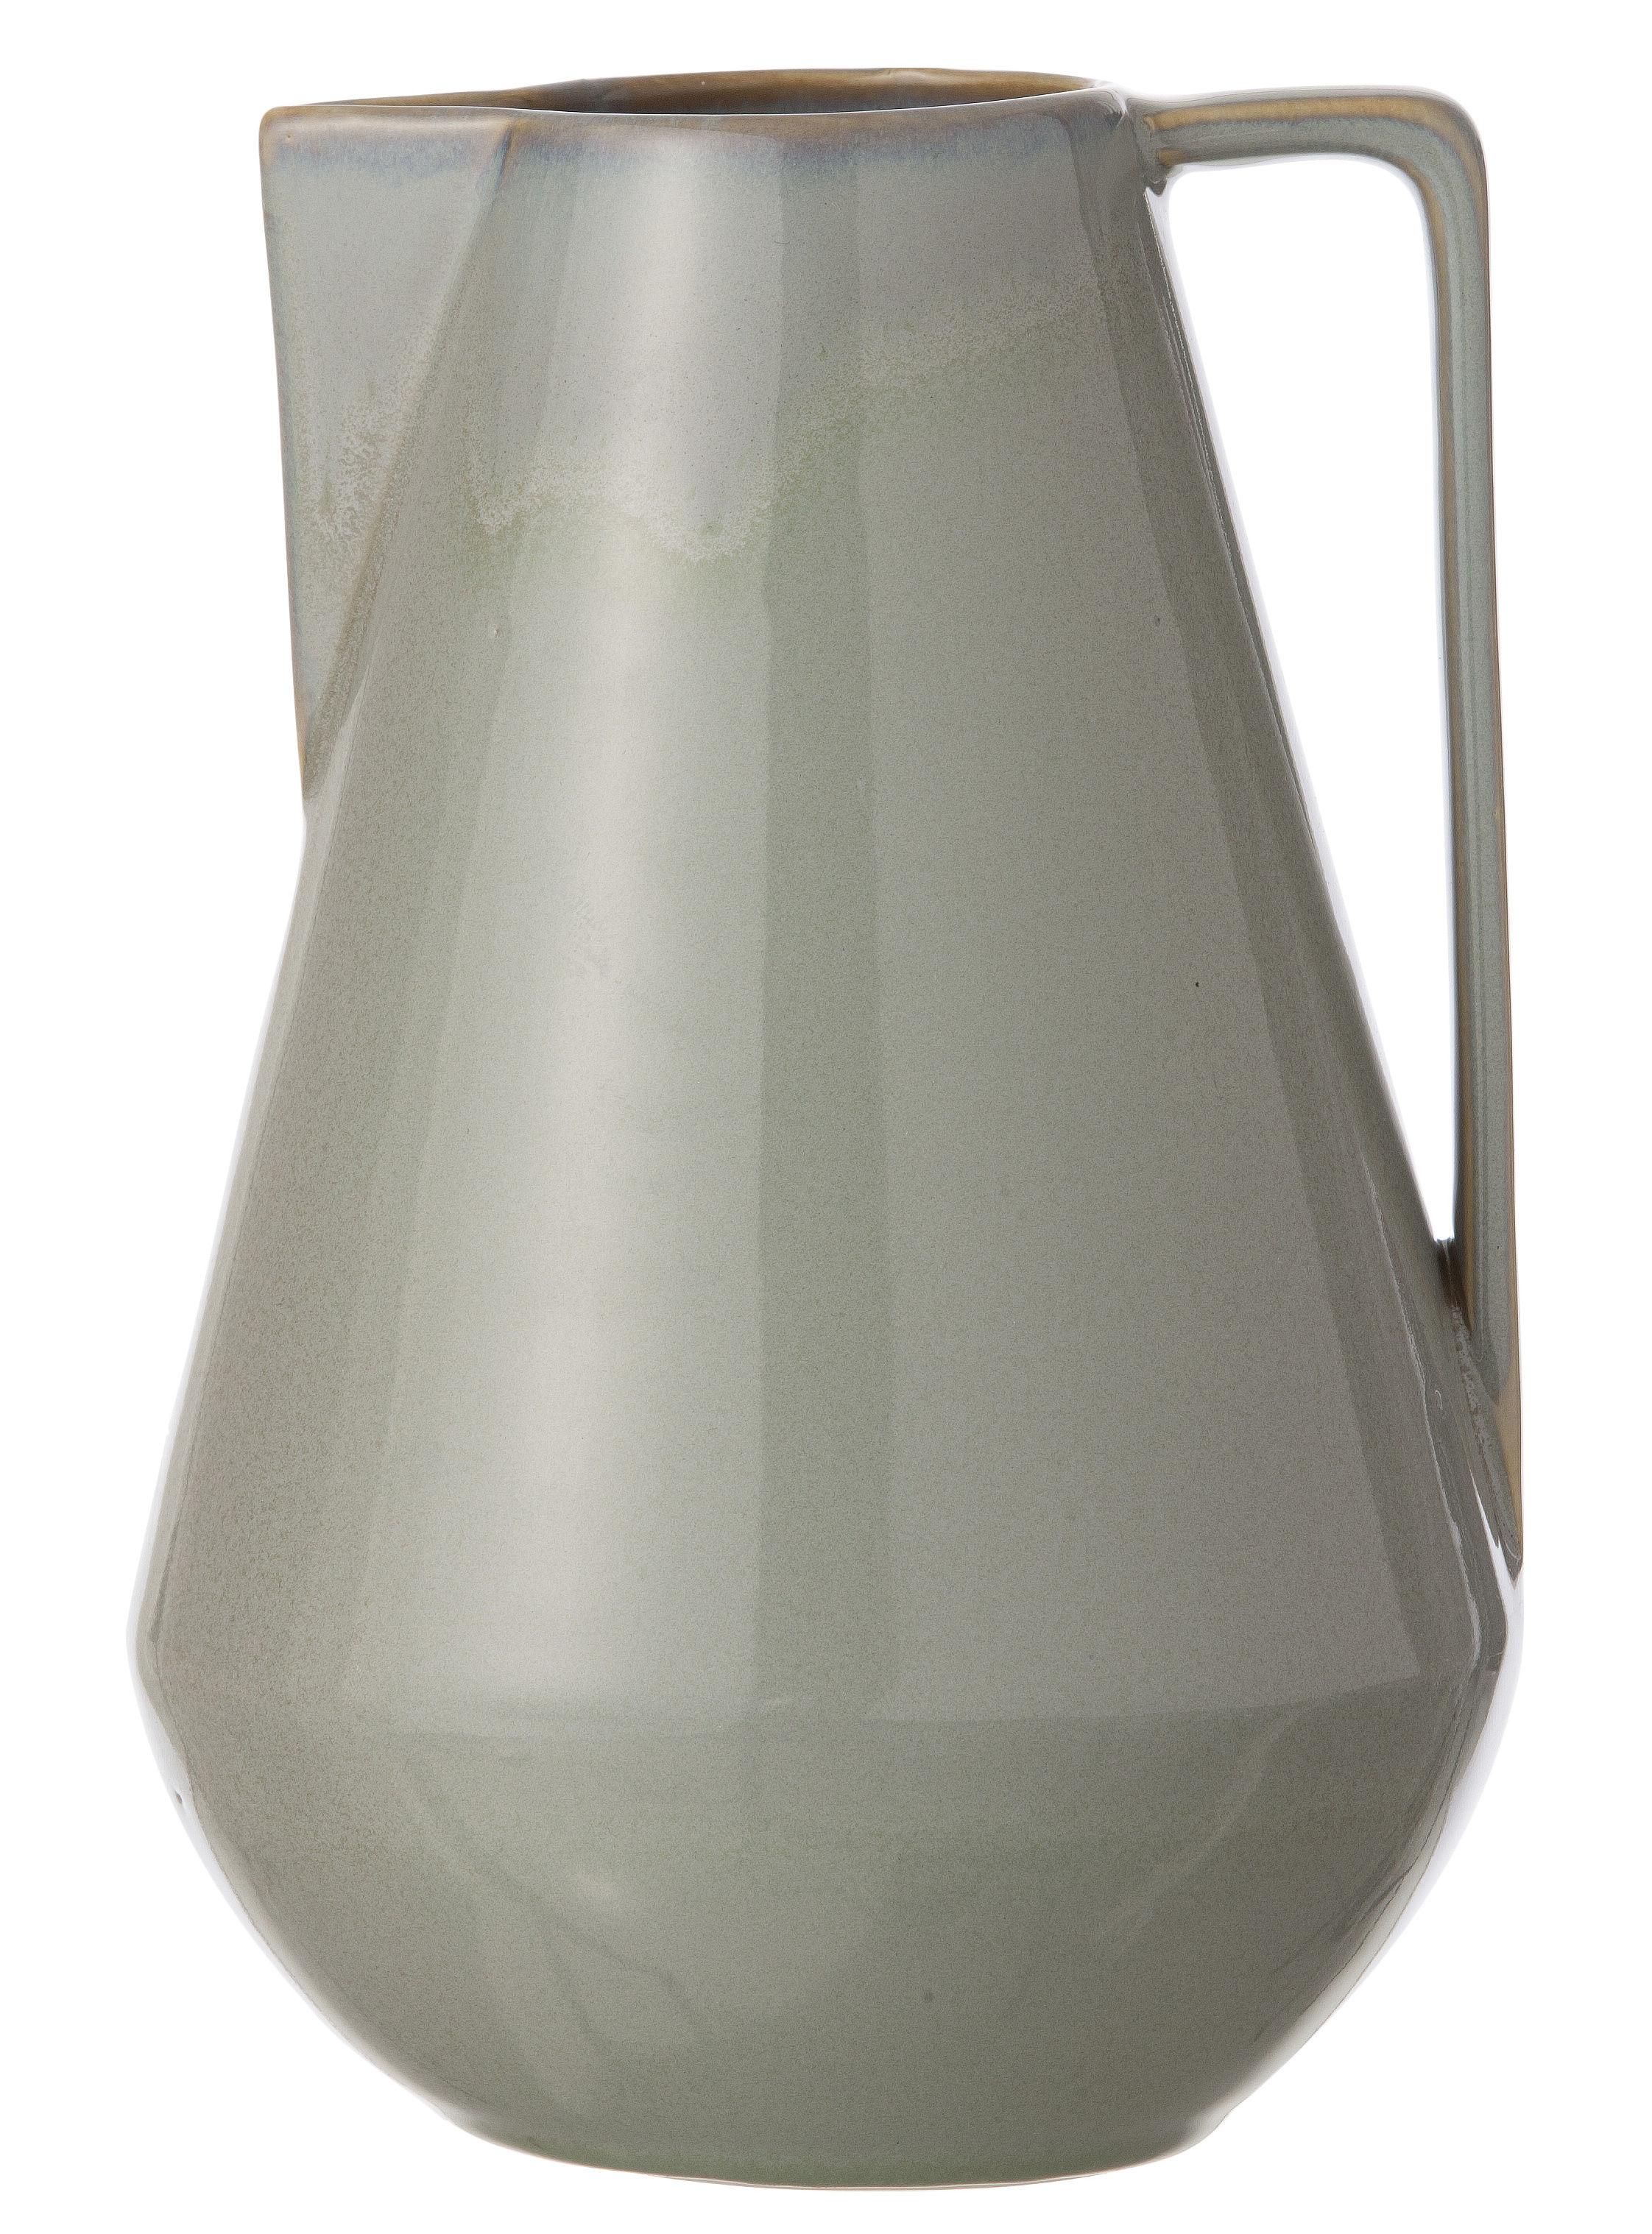 Tischkultur - Karaffen - Neu Large Karaffe Ø 15 x H 22 cm - Ferm Living - Grau - emaillierte Keramik